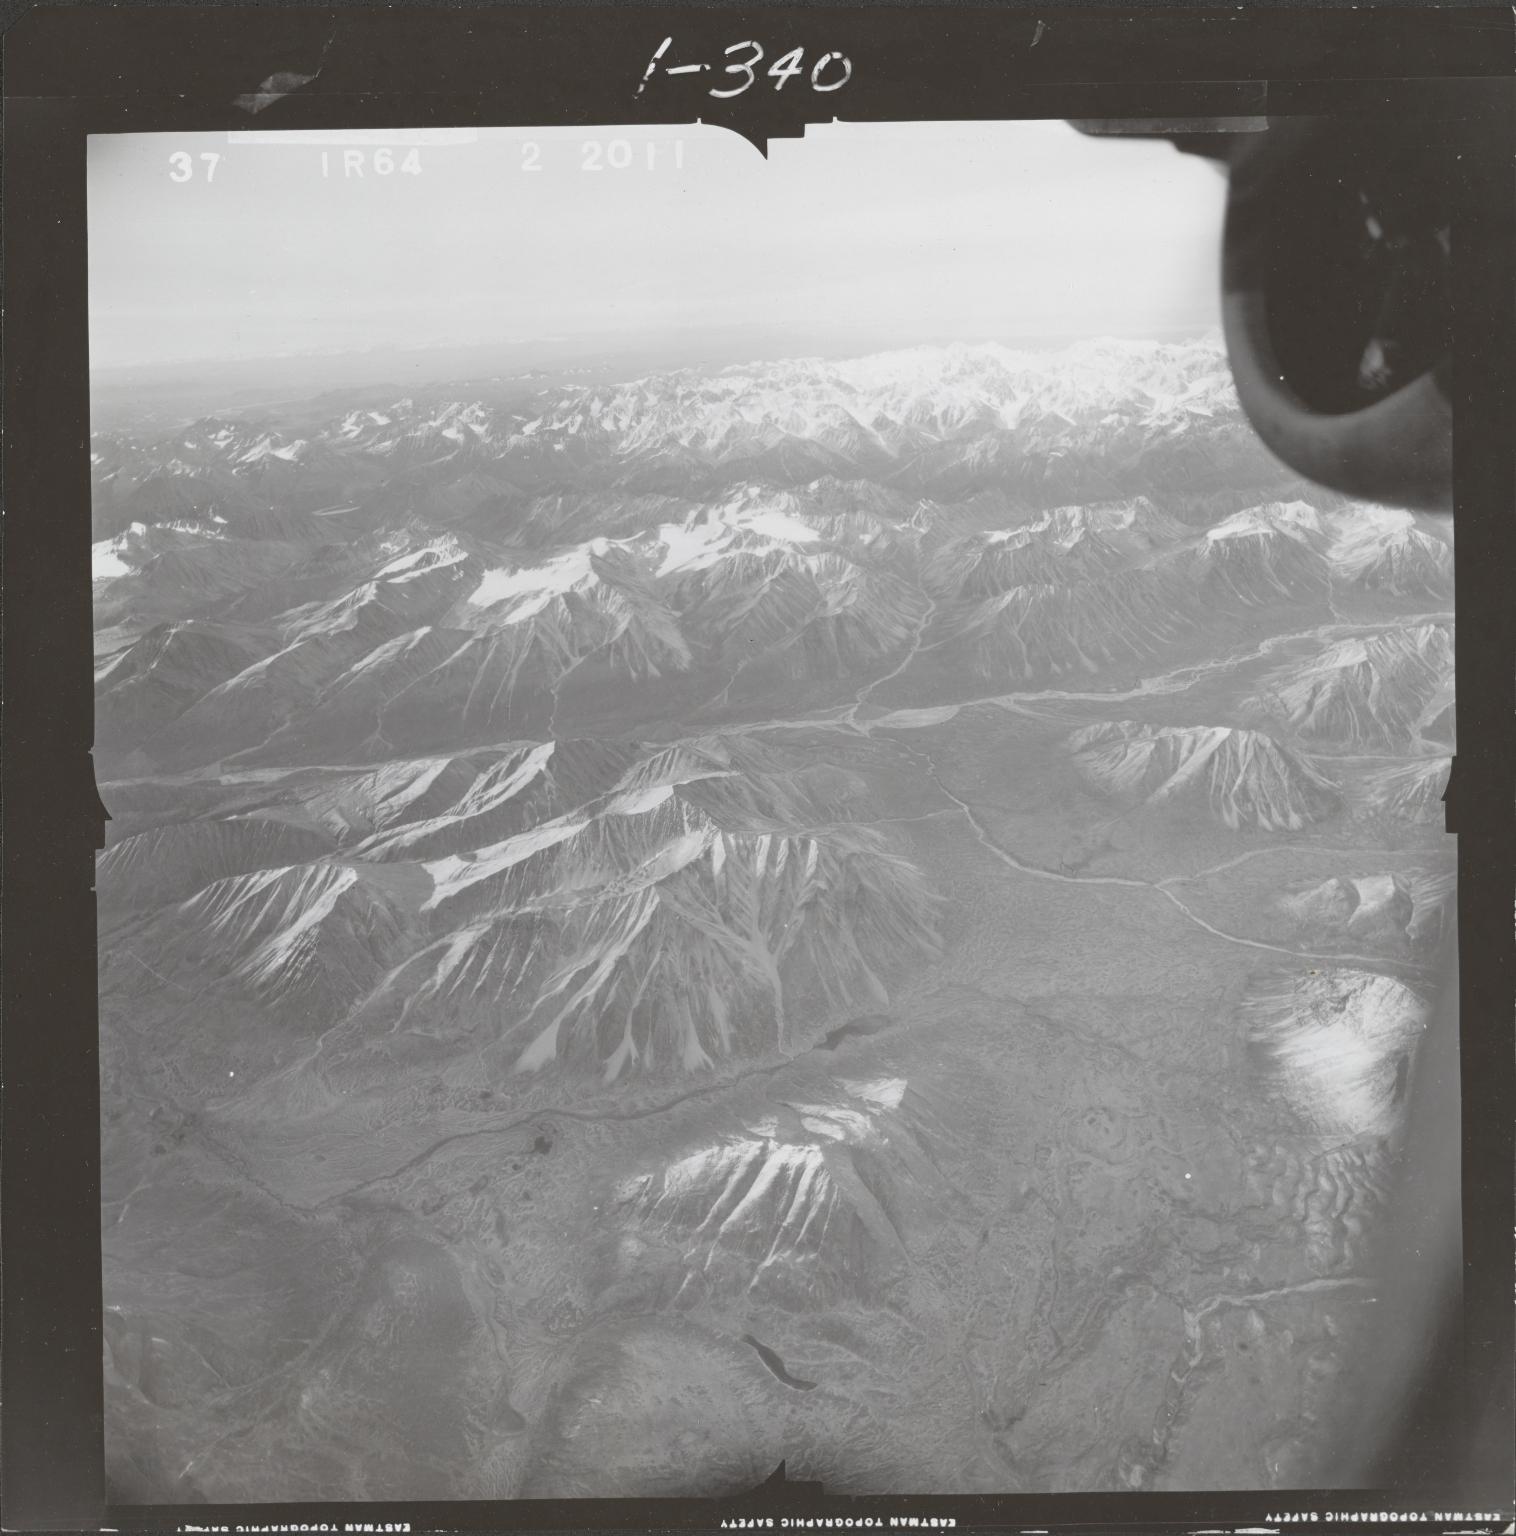 Northwest of Mount Gerdine, aerial photograph FL 68 R-64, Alaska